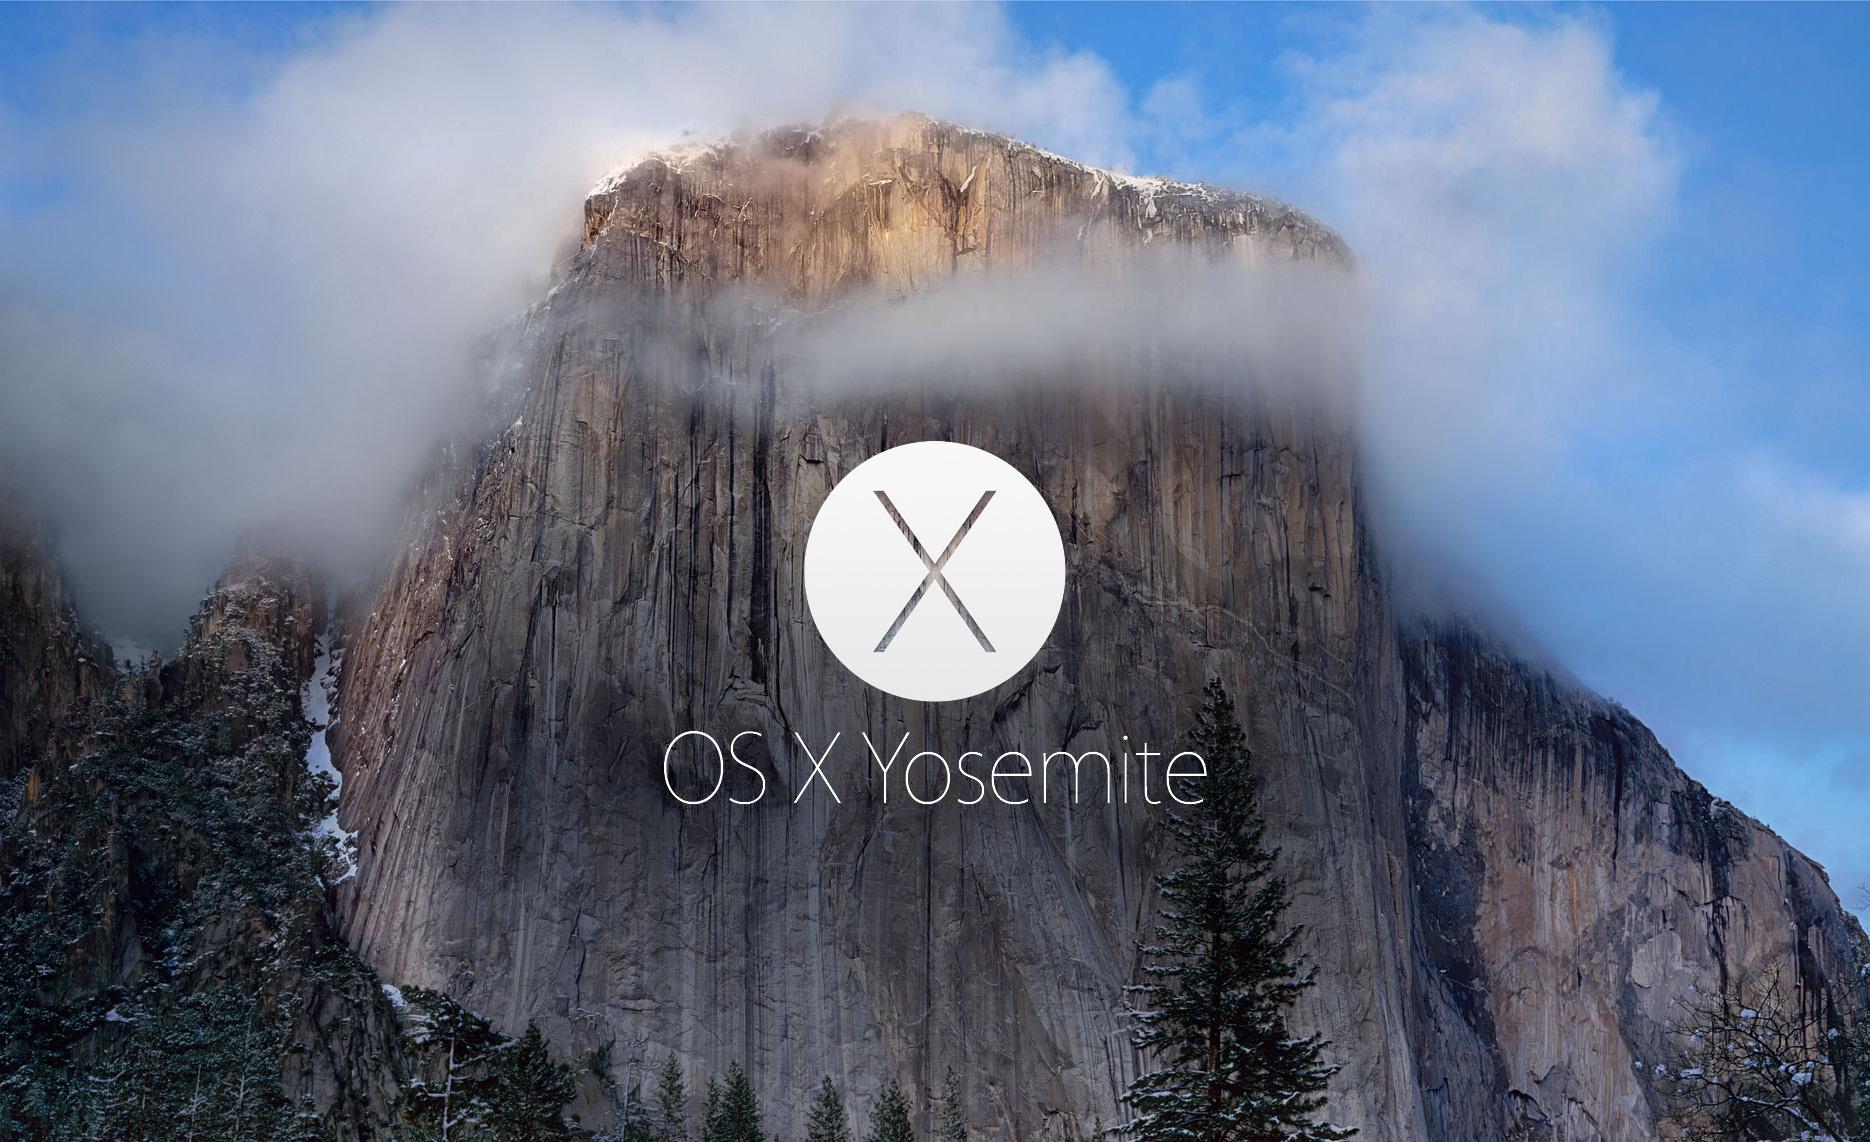 Source: Apple, OSX Yosemite